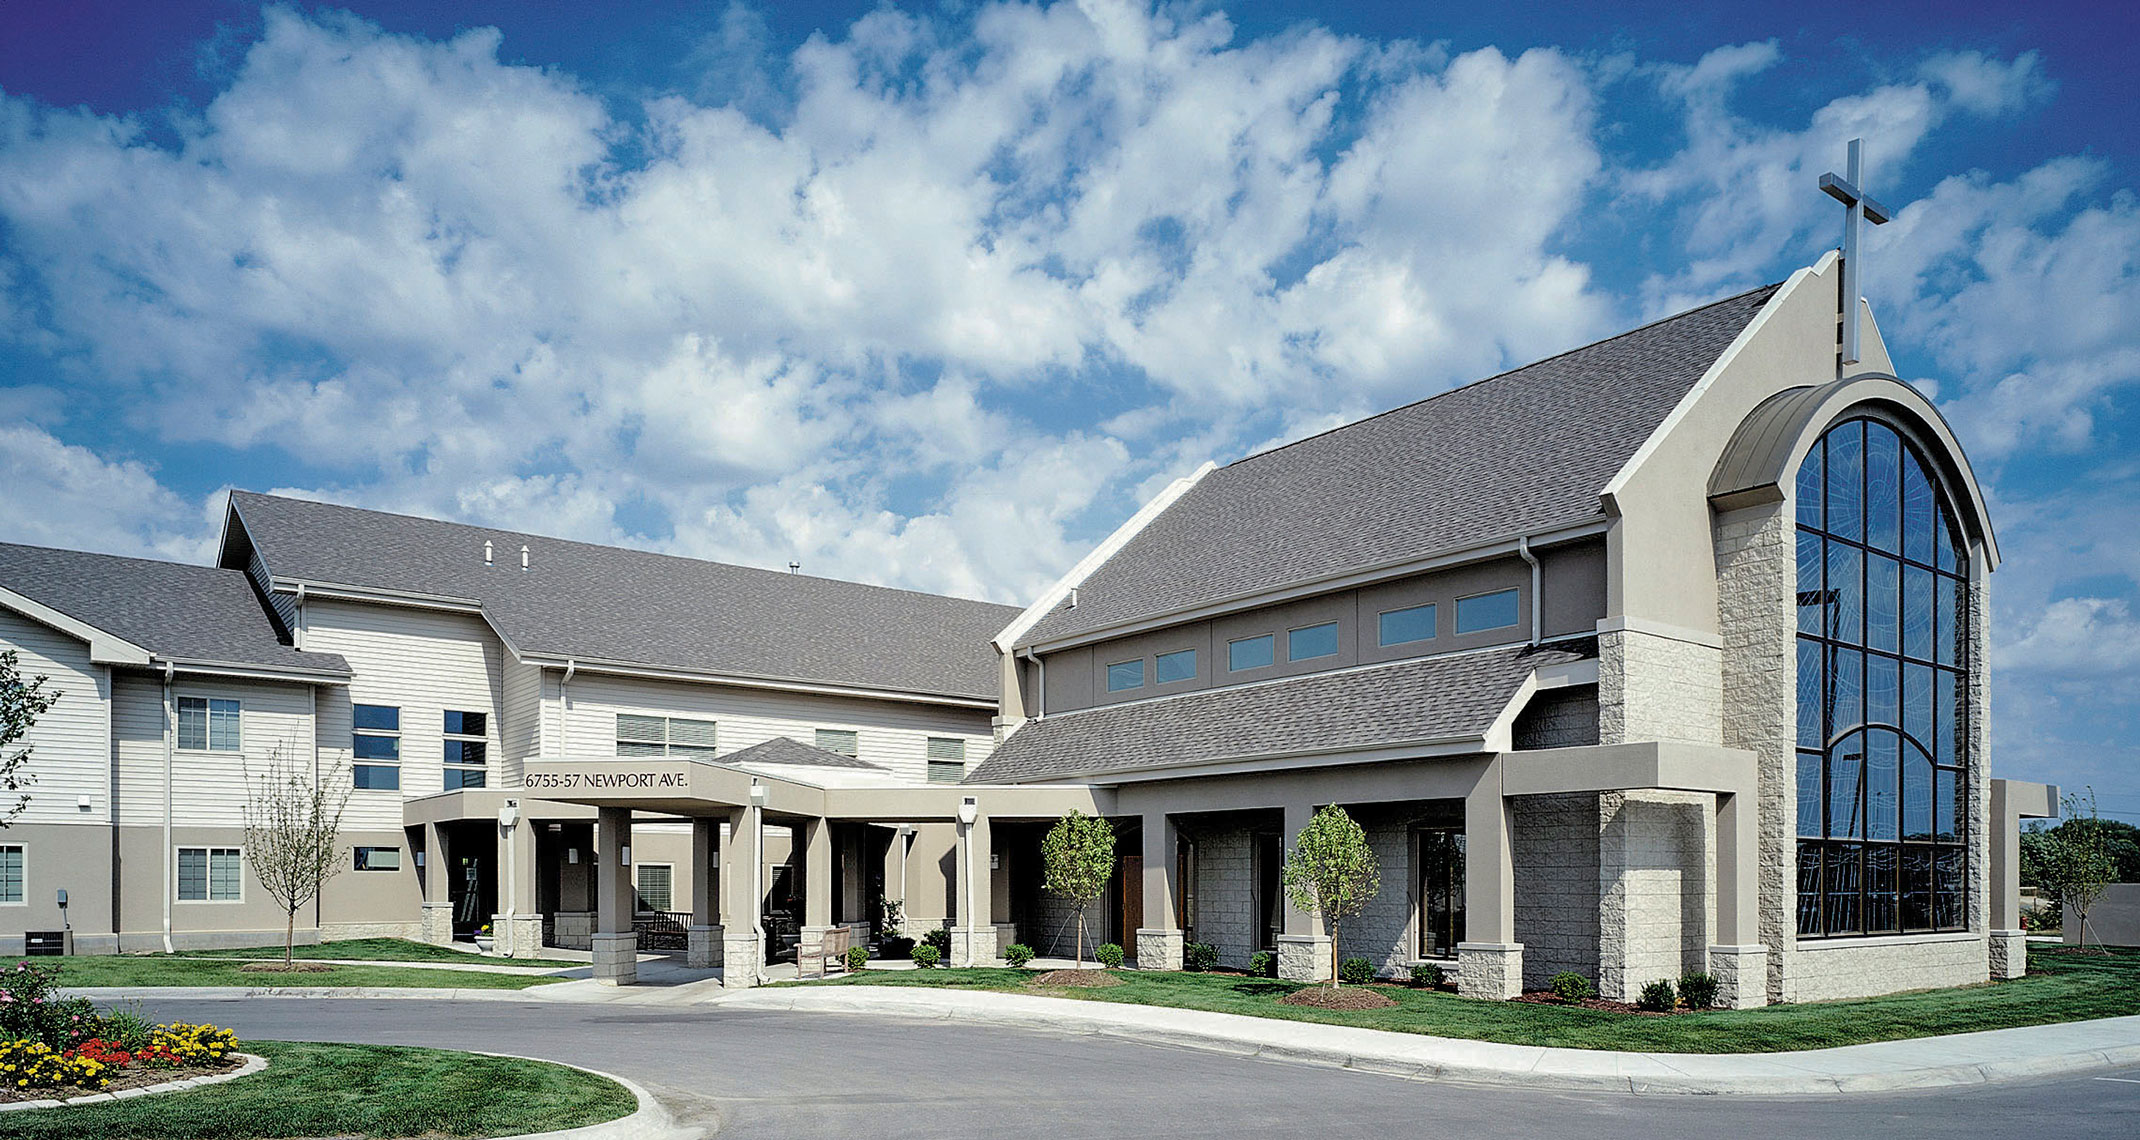 Image of Immanuel Courtyard in Omaha, Nebraska